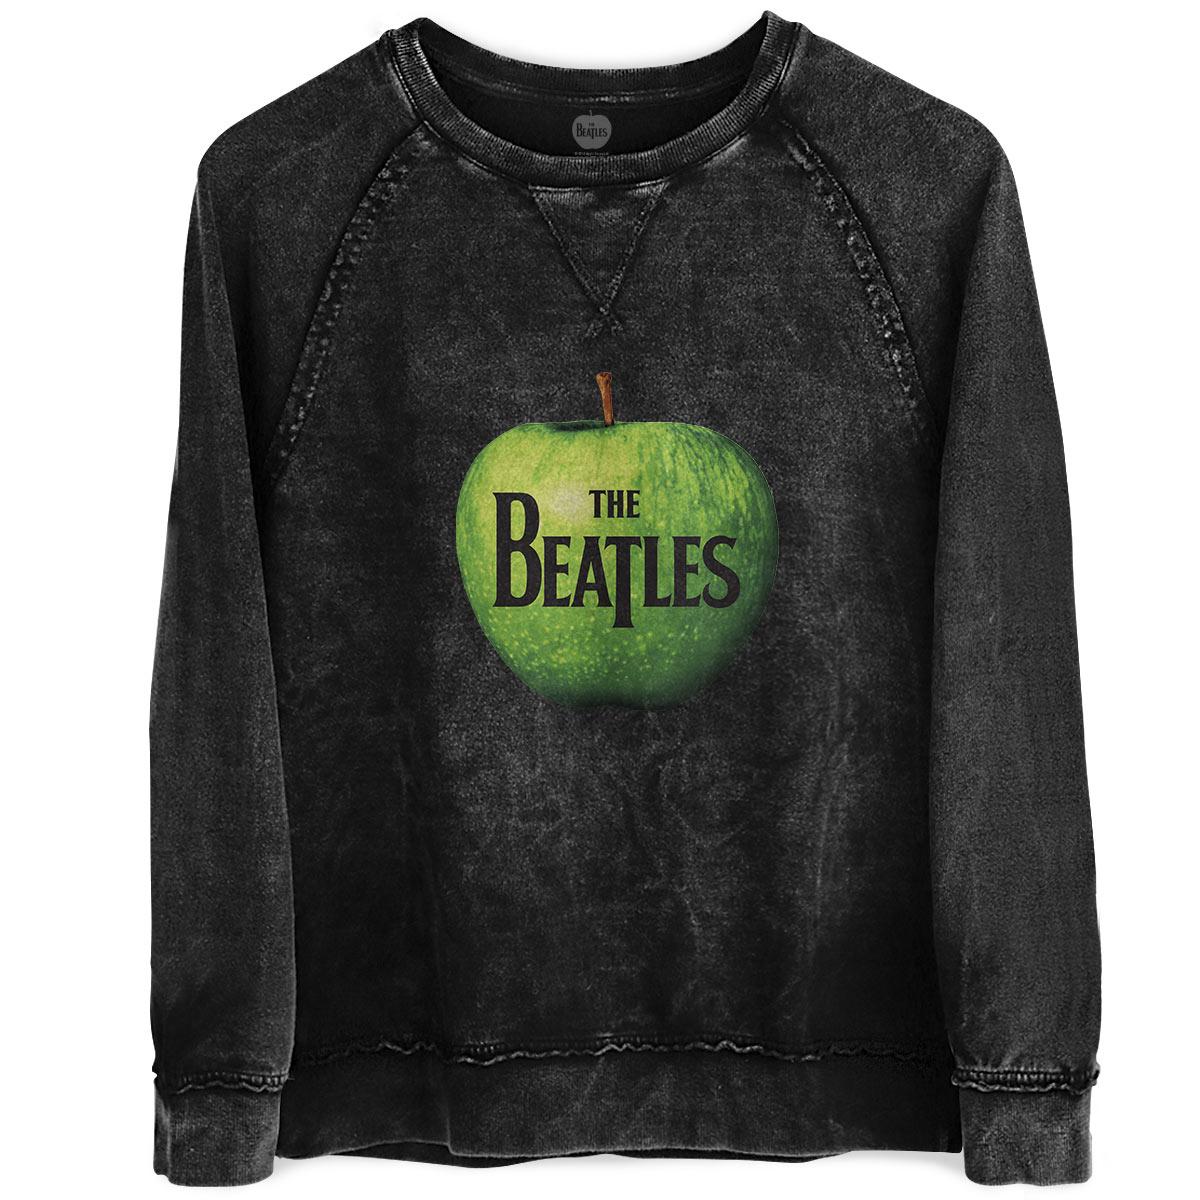 Moletinho Marmorizado The Beatles Apple Records